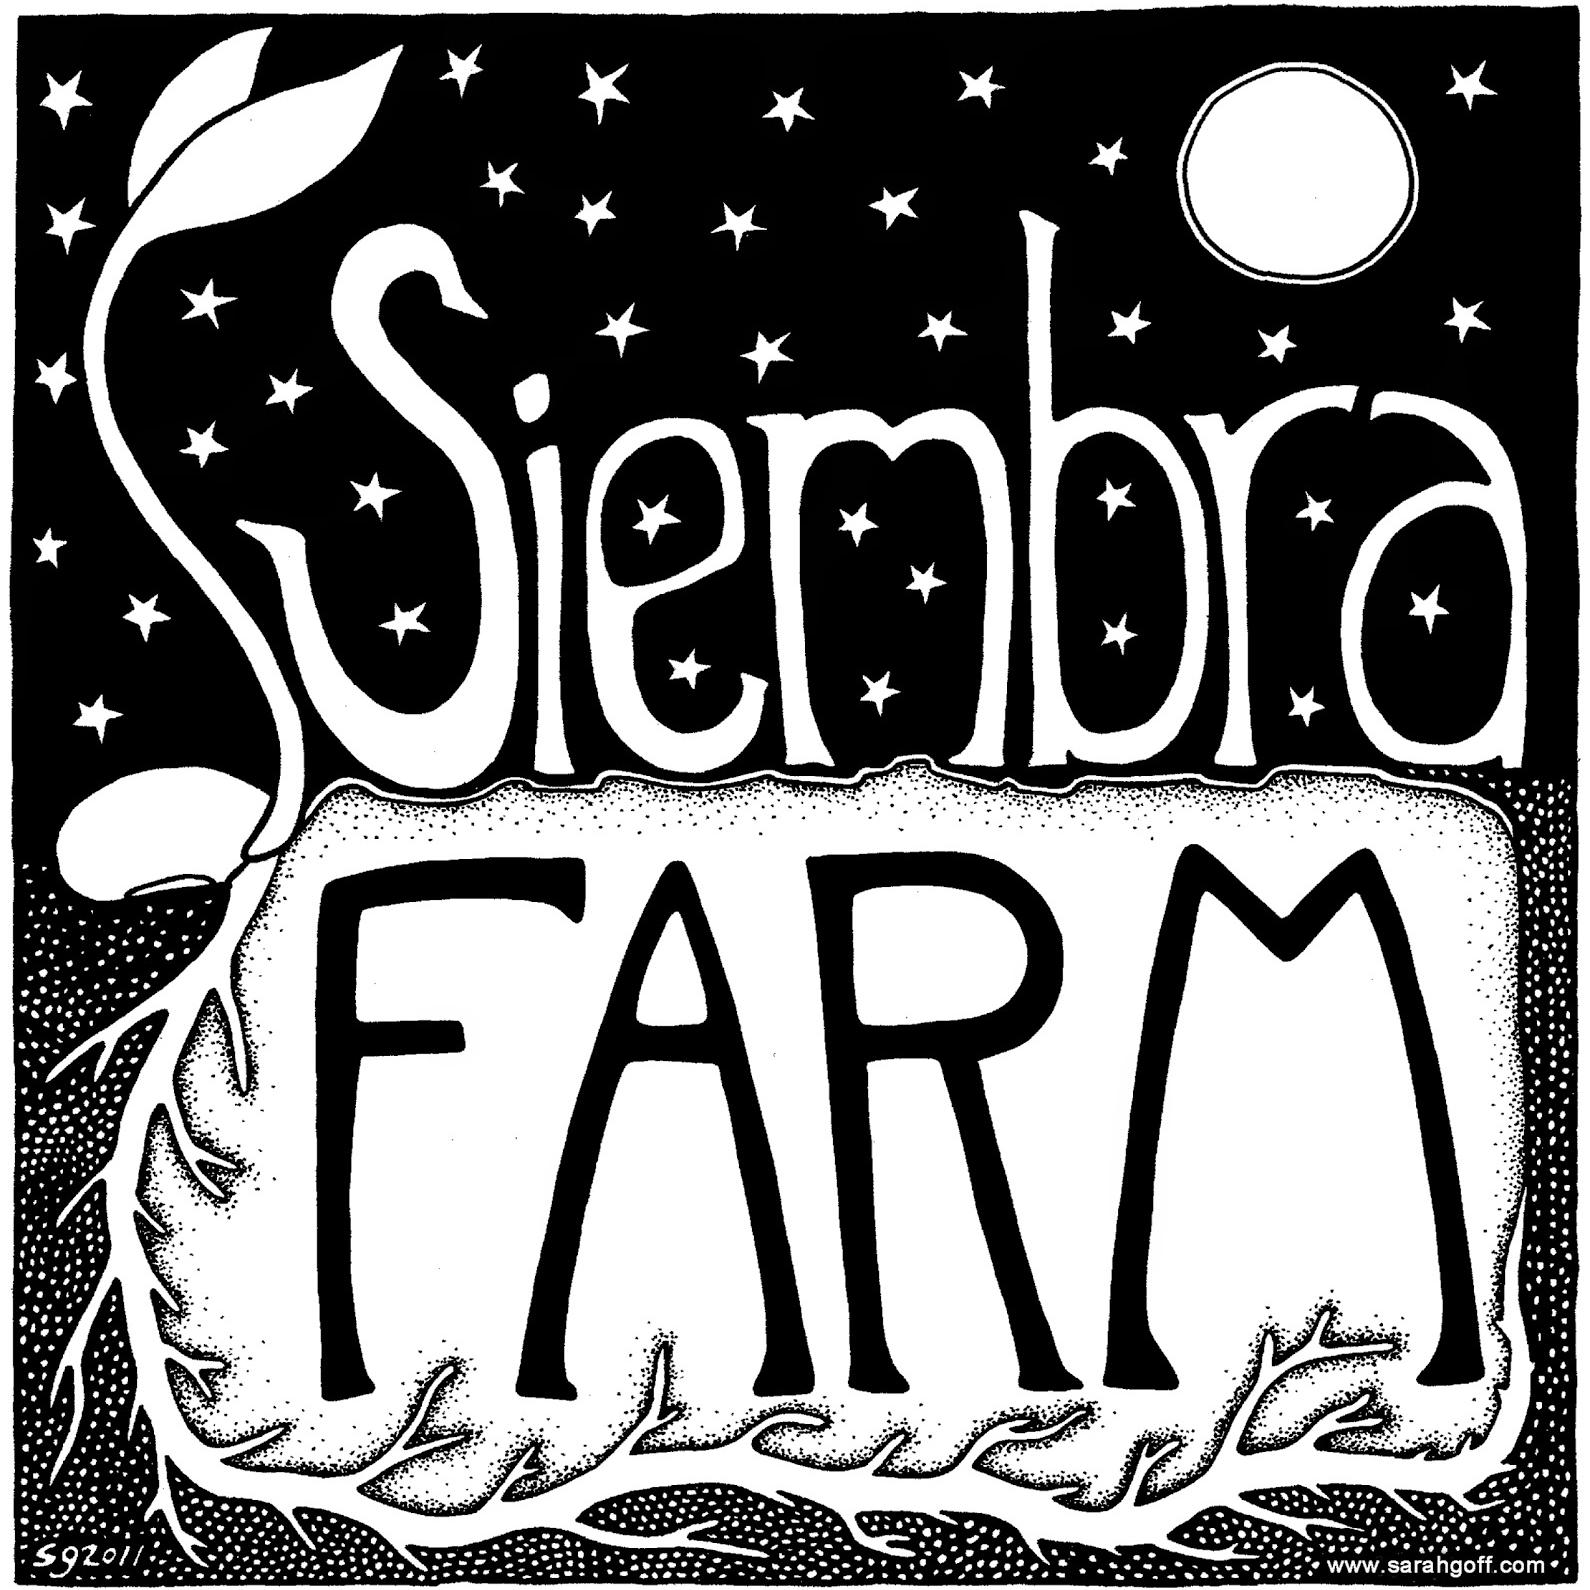 Siembra Farm